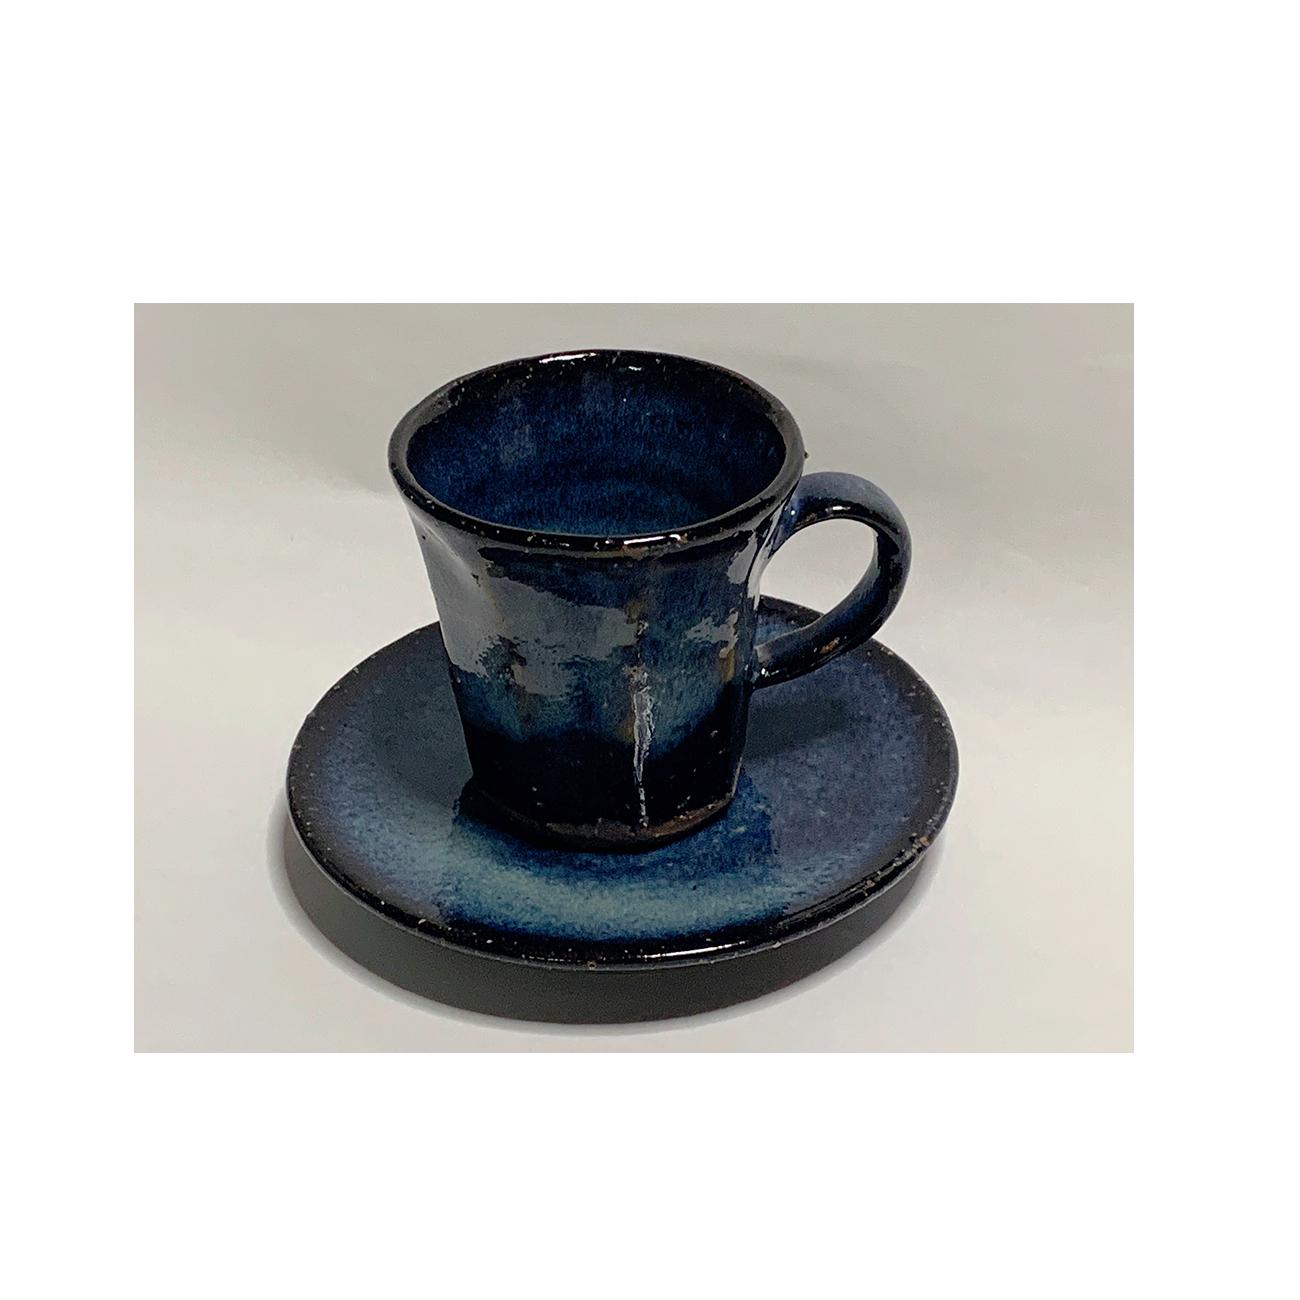 Japanese wholesale high quality handmade pottery tumbler mug